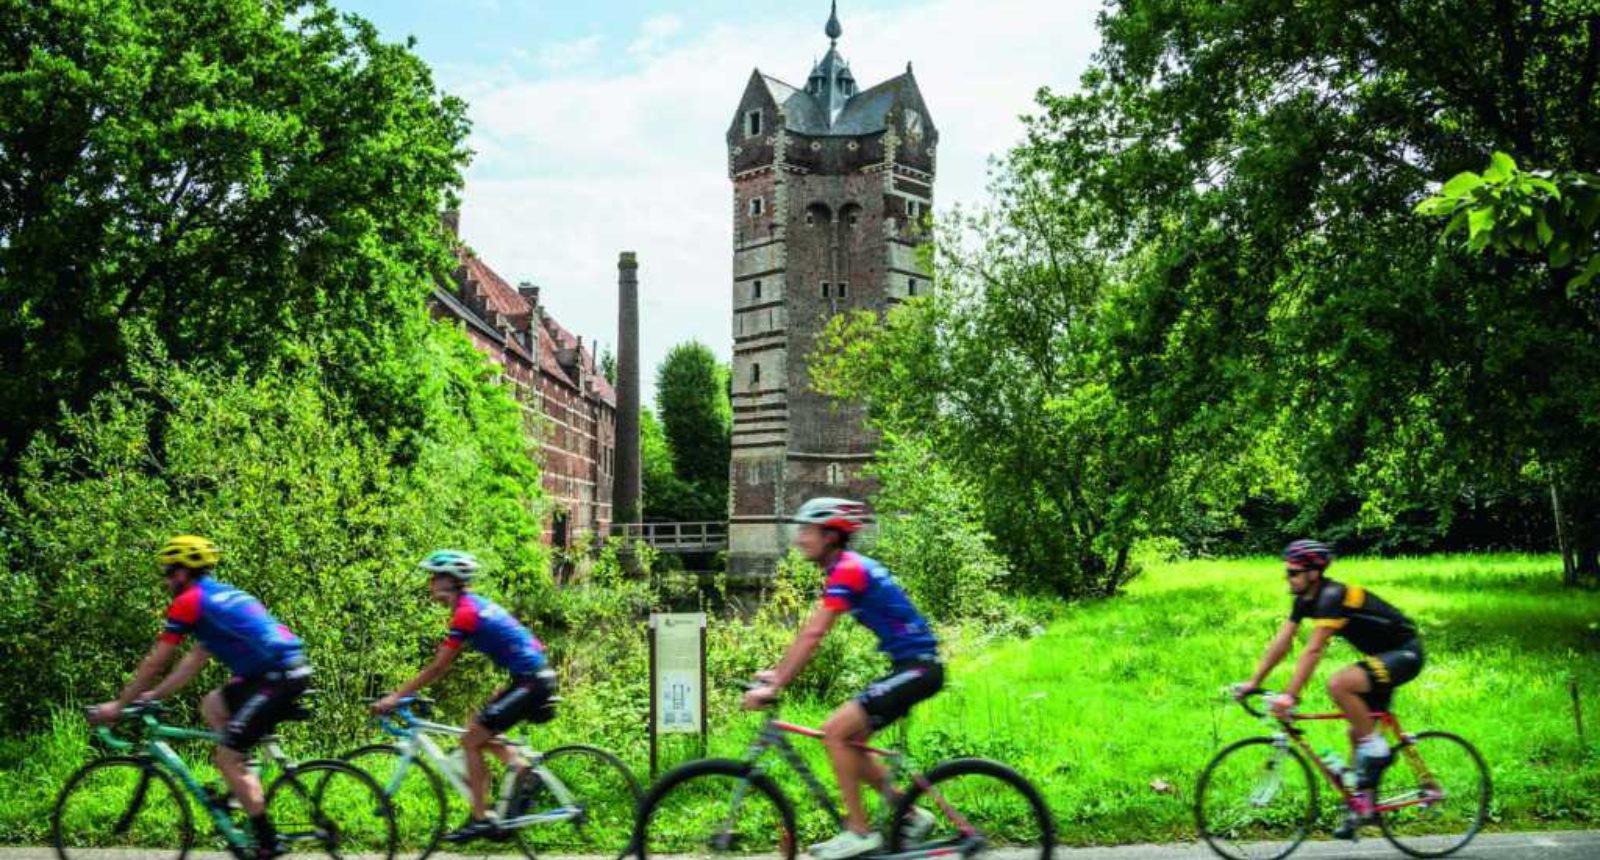 Sven Nys Cycling route donjon 9 Lander Loeckx min